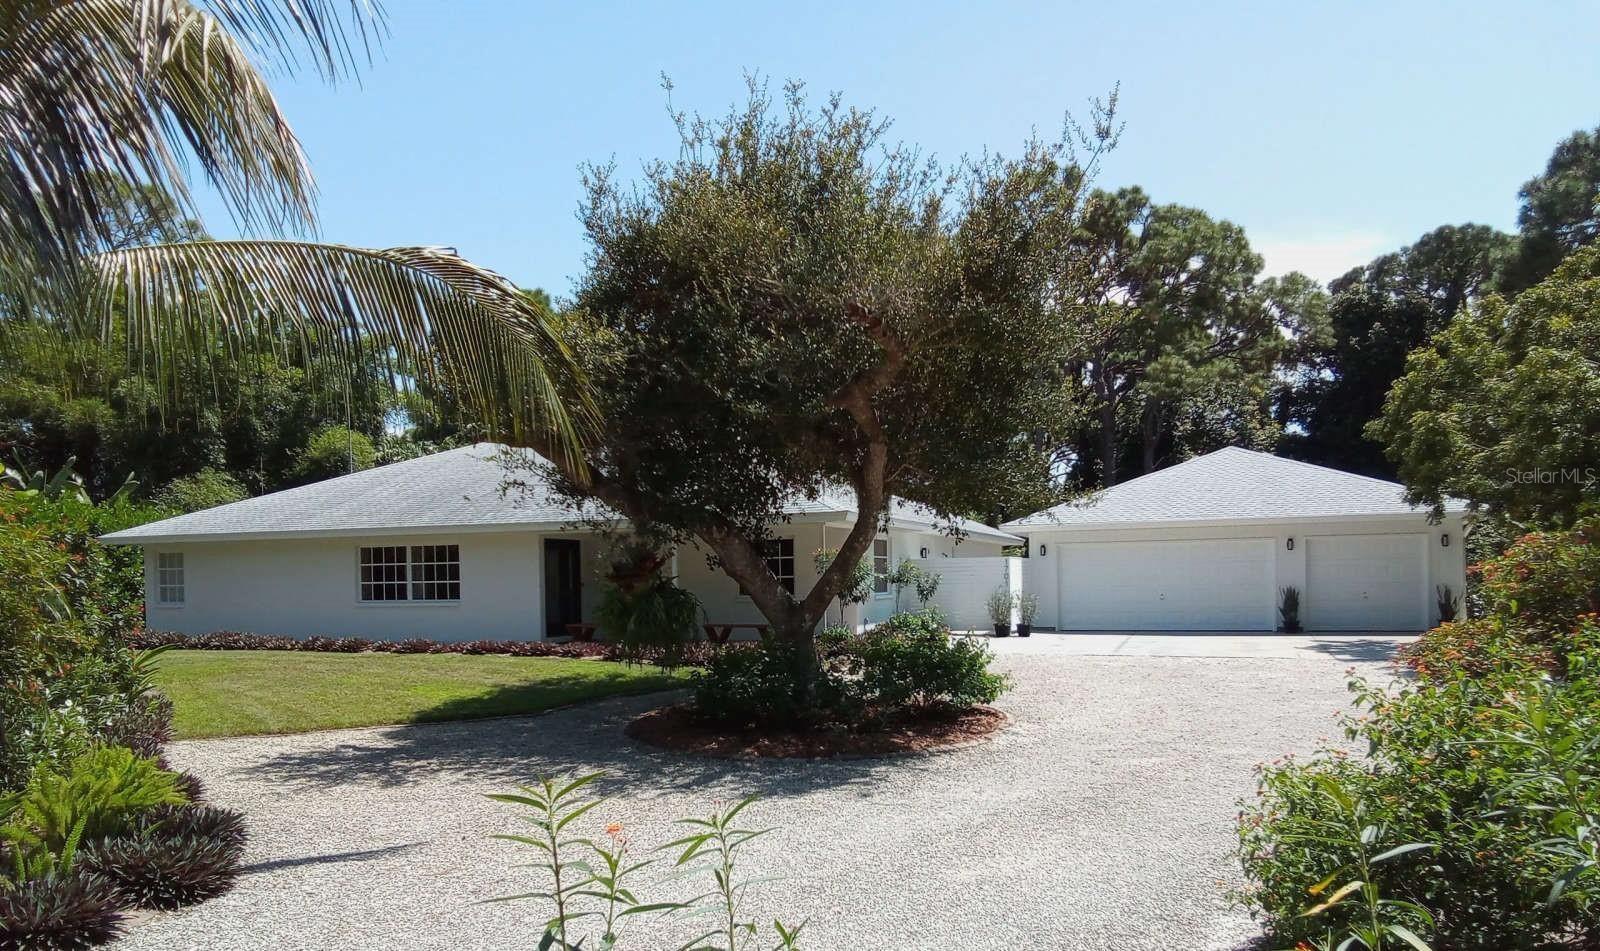 Photo of 1701 KEYWAY ROAD, ENGLEWOOD, FL 34223 (MLS # O5971221)